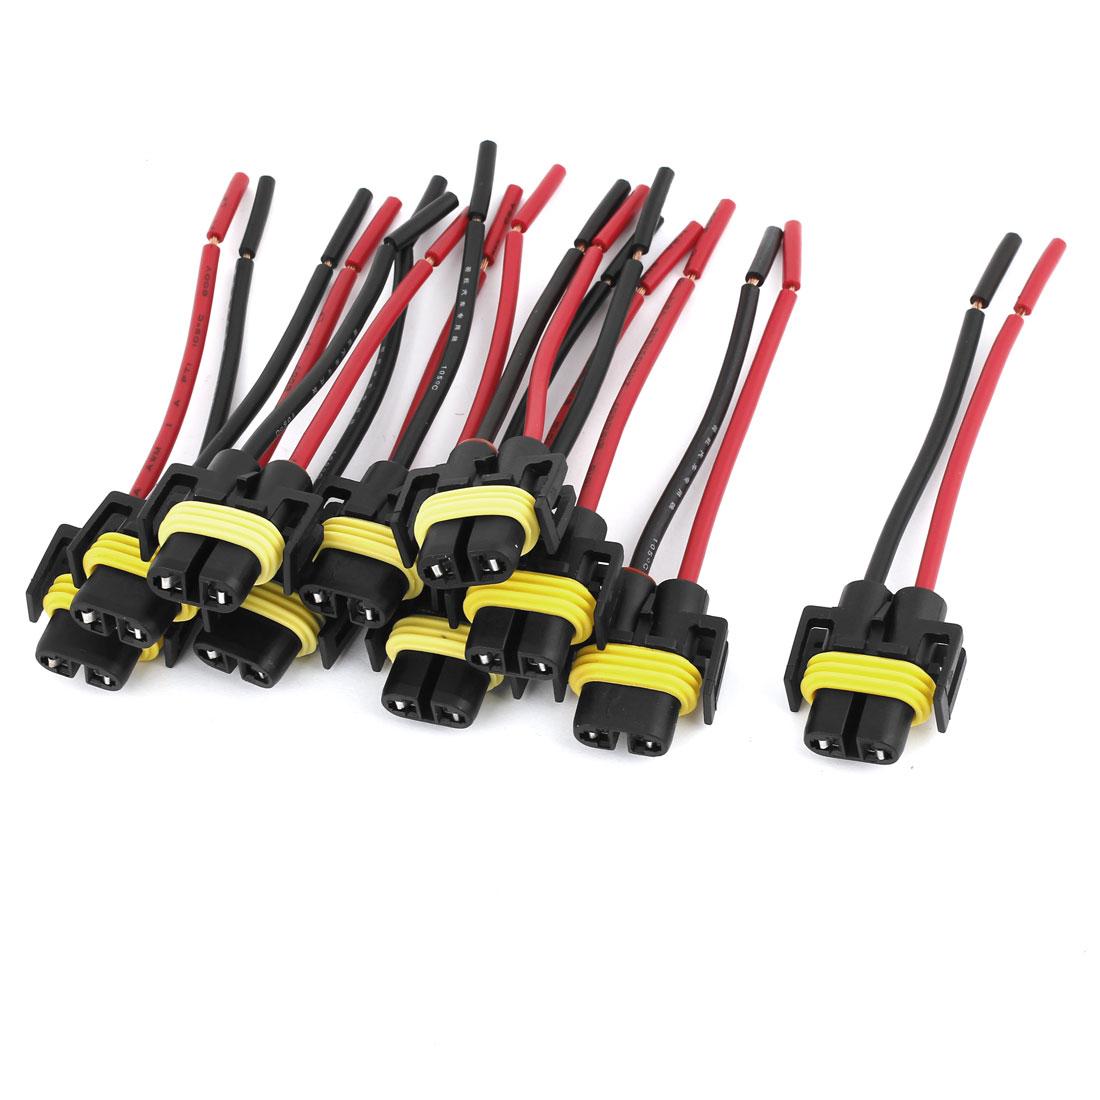 10 Pcs Auto Car Headlight H11 Socket Harness Plastic Connector Base Plug